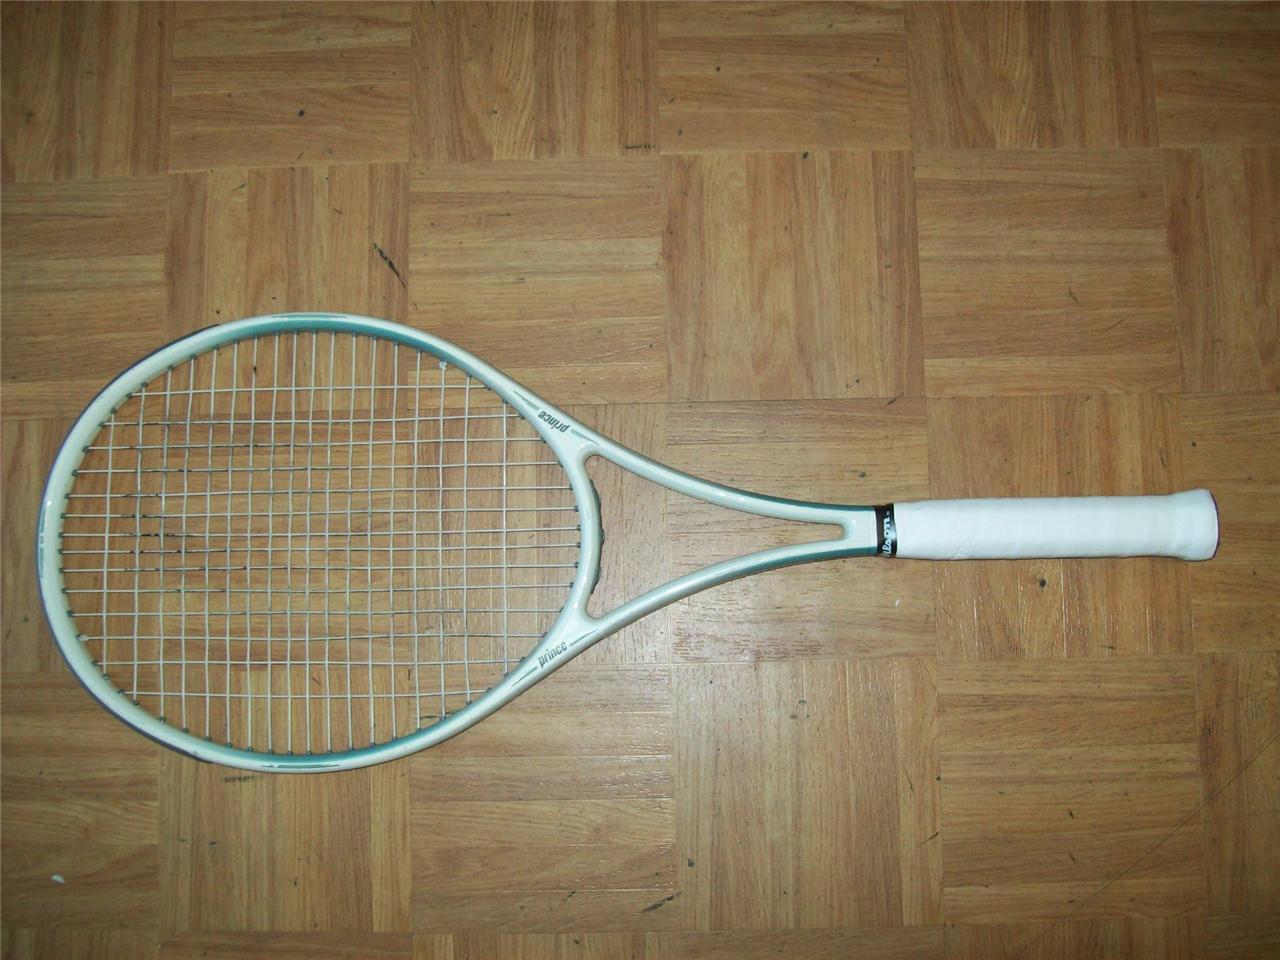 Prince Tricomp 90 4 1 4 grip Tennis Racquet